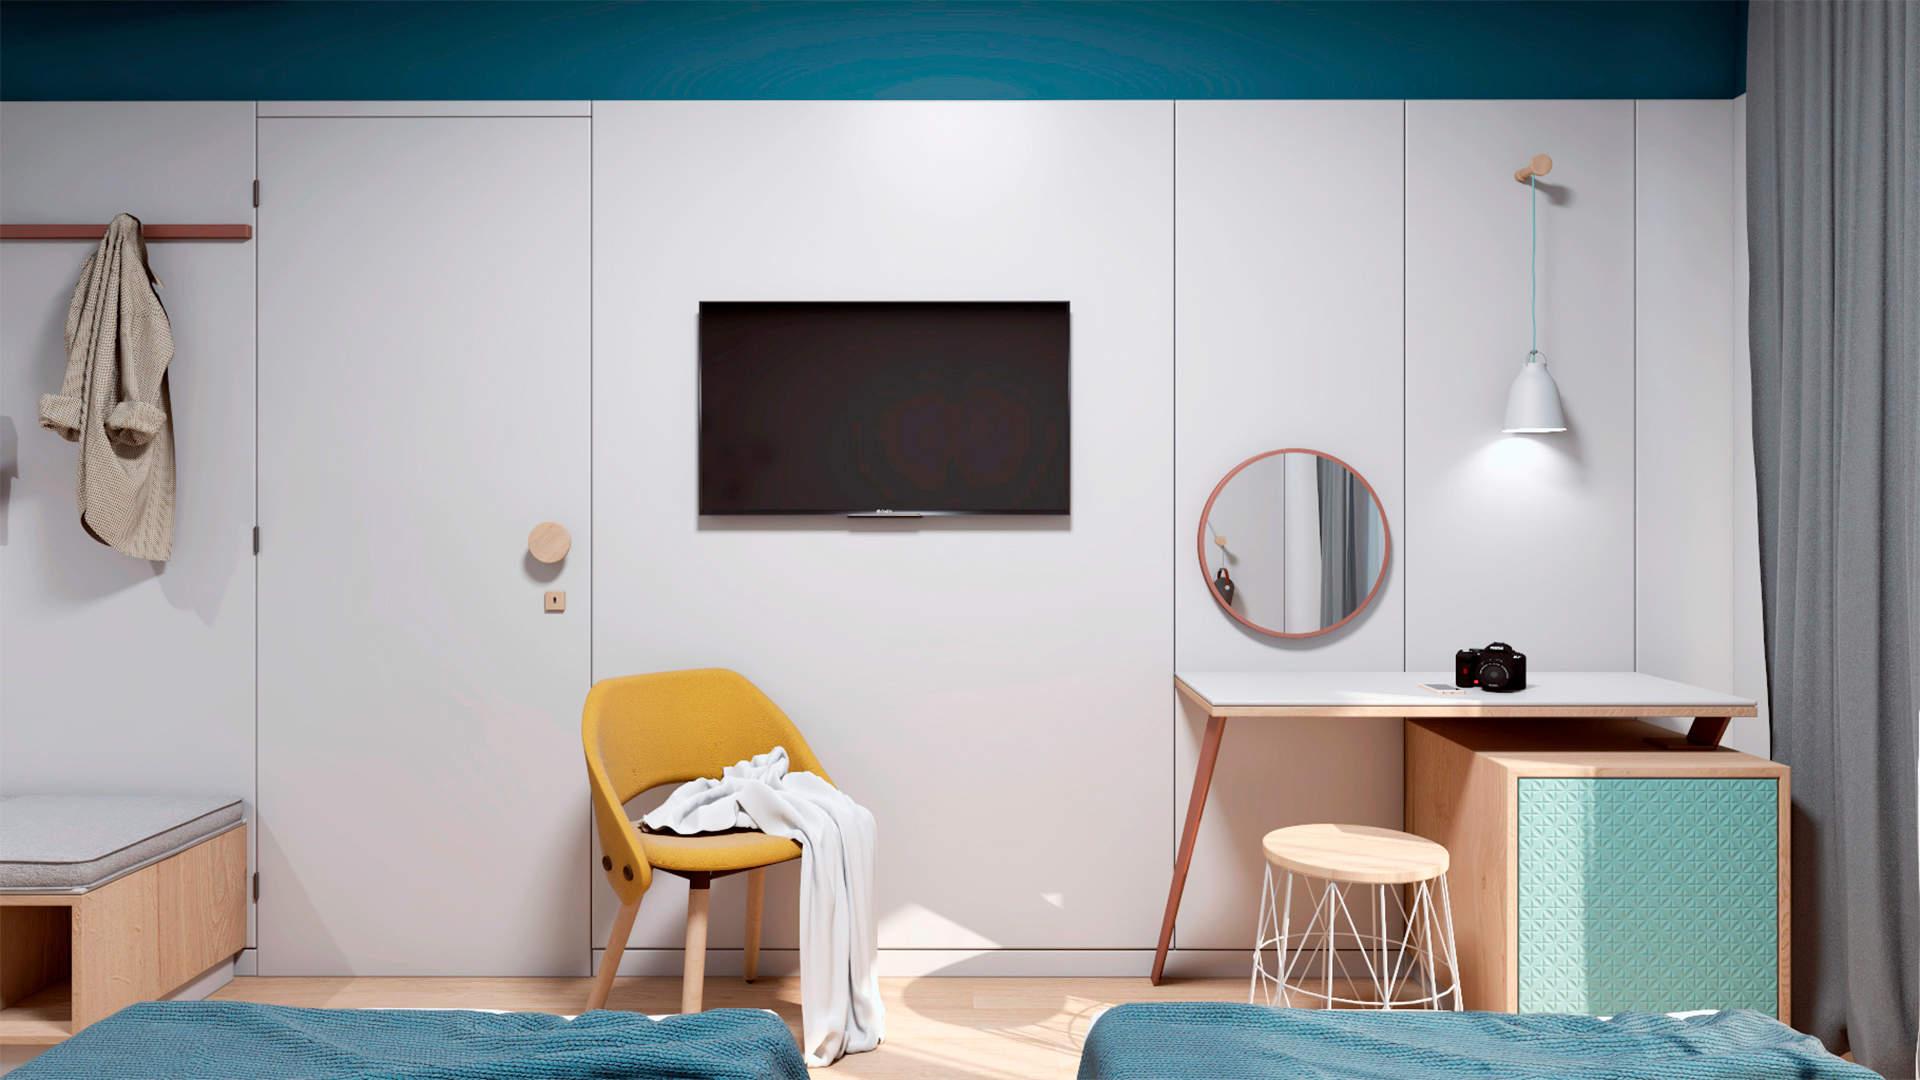 City hotel room, interior design, dressing table, desk. Δωμάτιο αστικού ξενοδοχείου, γραφείο.